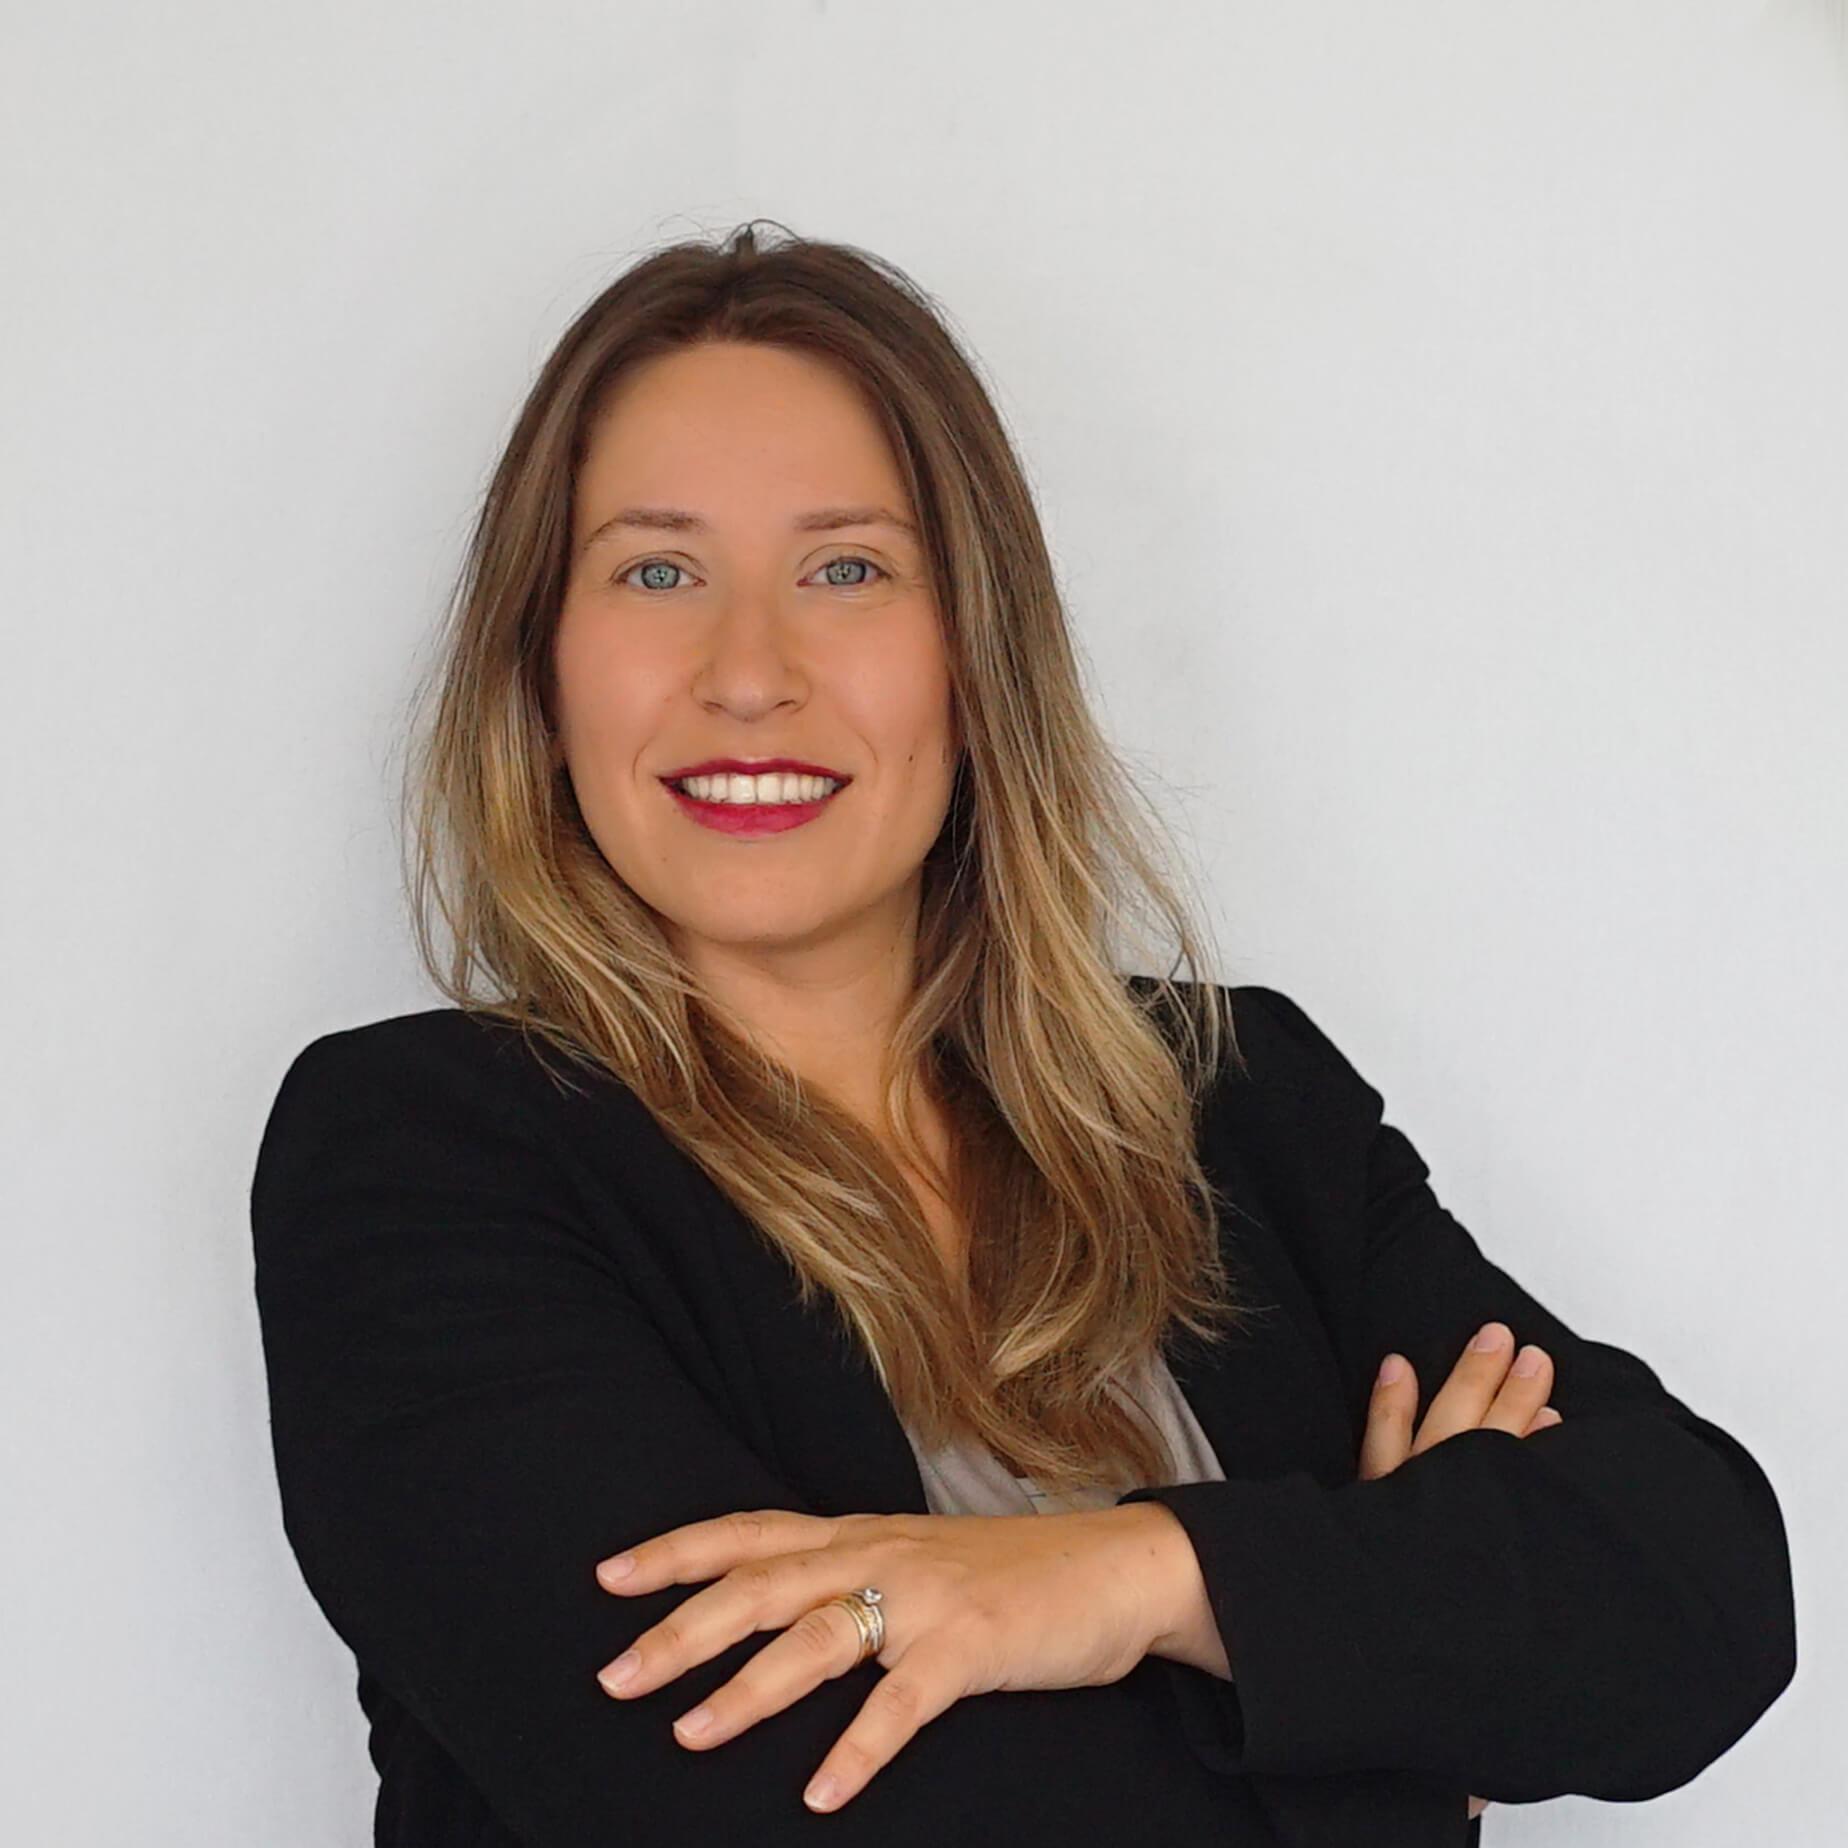 Tatiana Pereira - Manager @ IT People Innovation